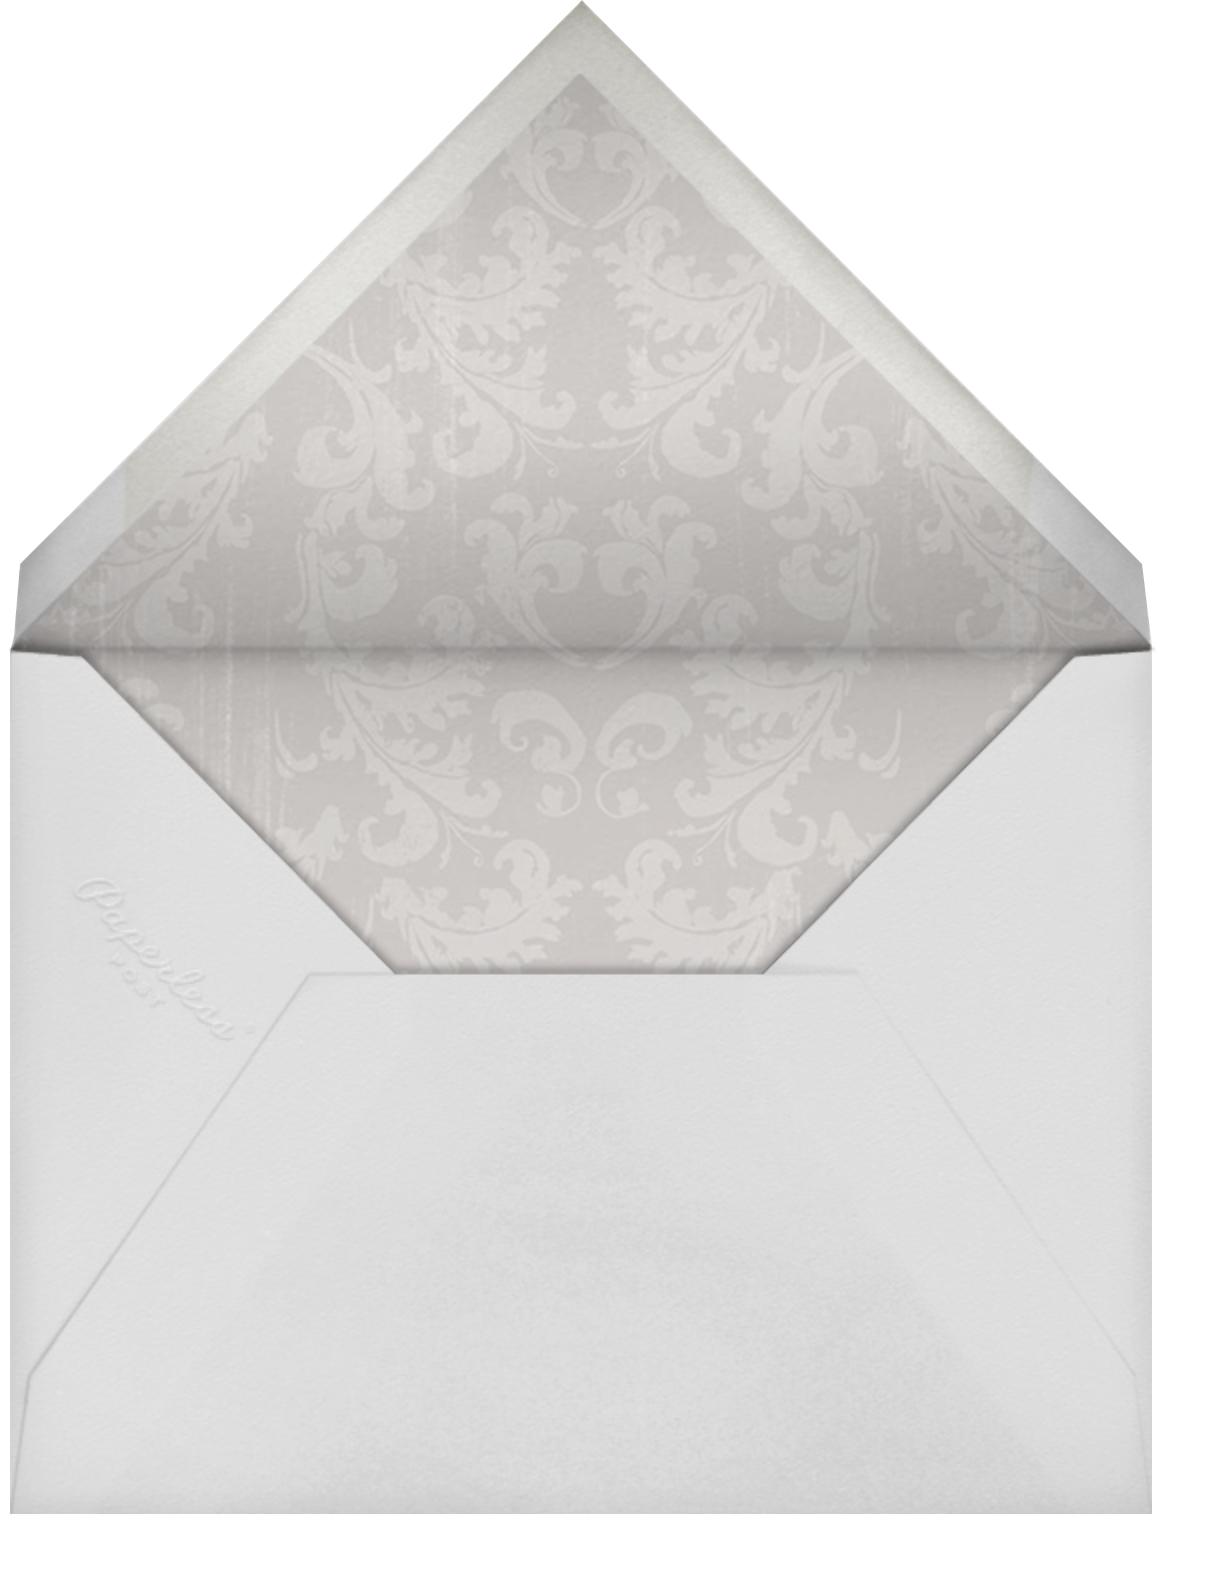 Triple Interior Border (Tall) - Gold - Paperless Post - Envelope